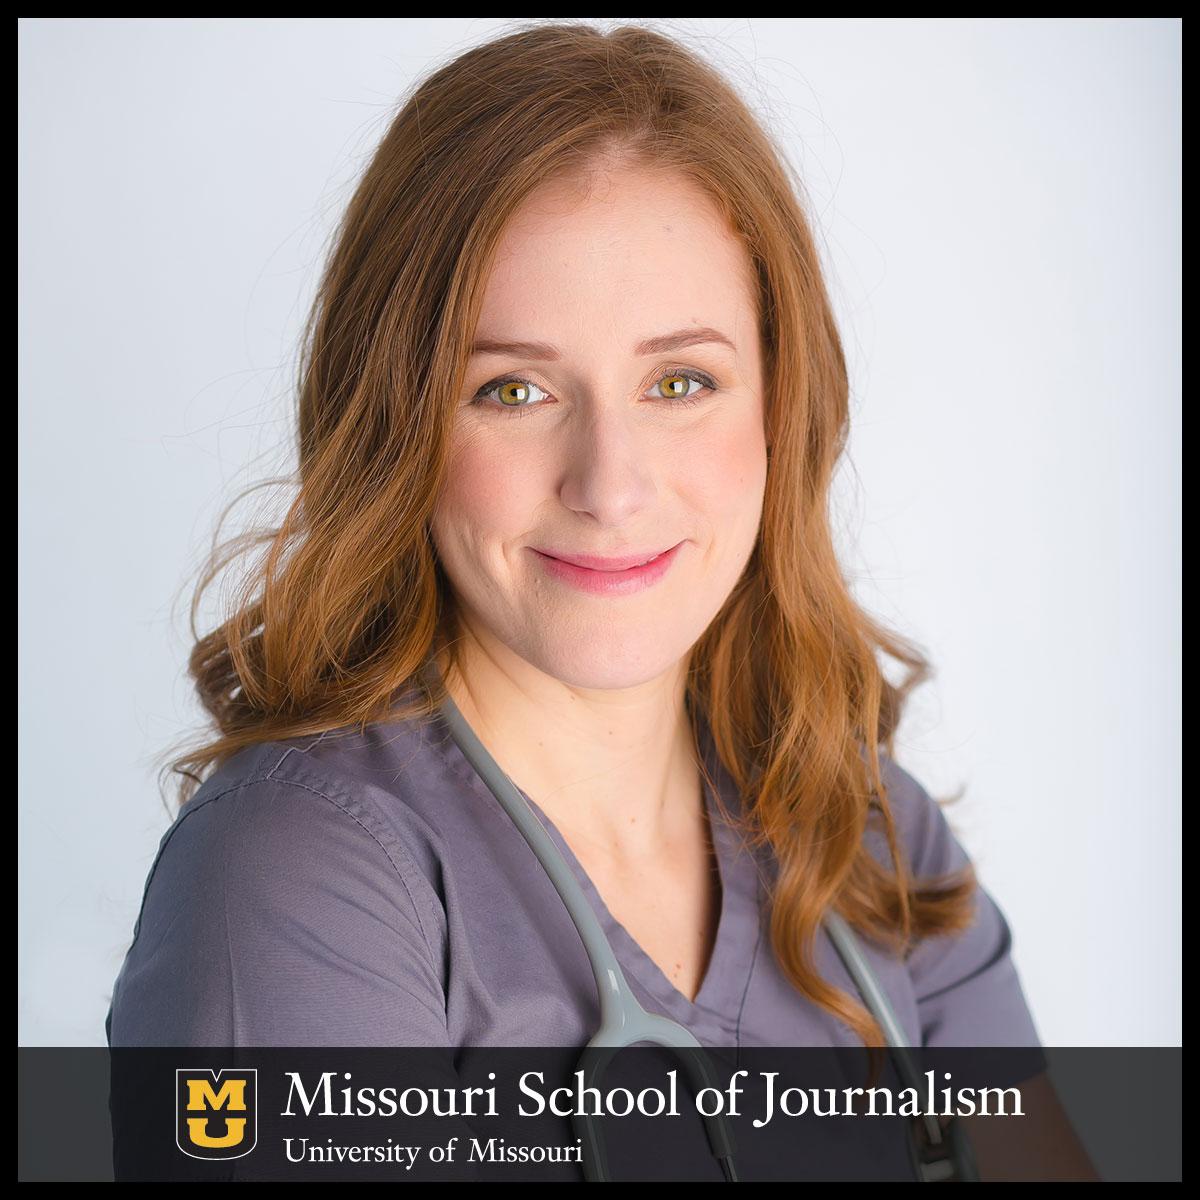 Melissa Gersin